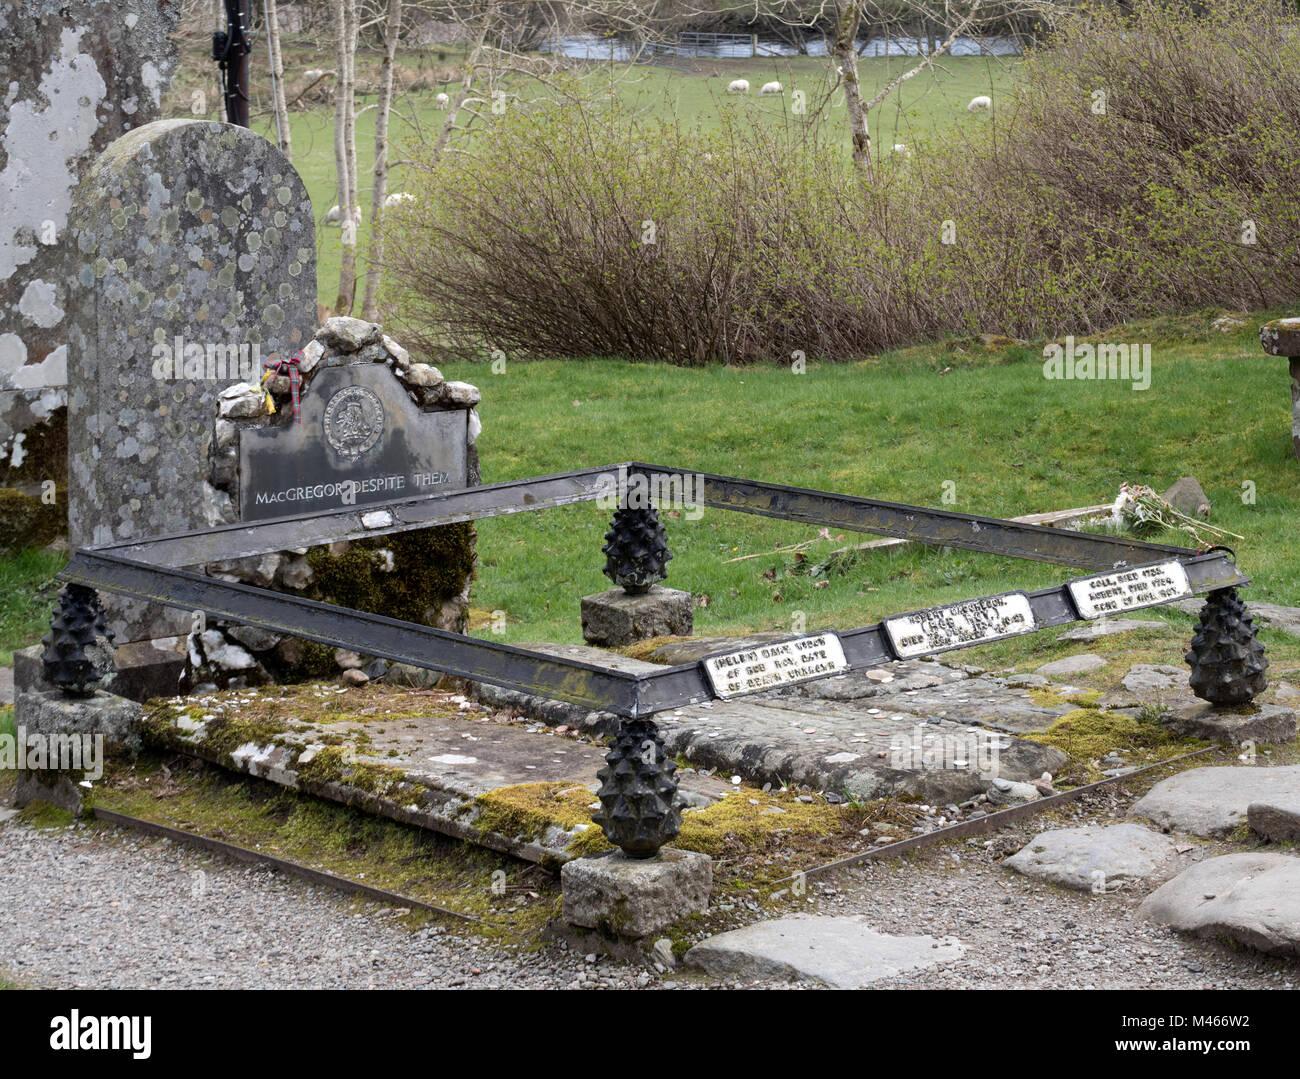 The grave of Rob Roy McGregor at Balquhidder Church, Balquhidder, Strathyre, Scotland, UK Stock Photo